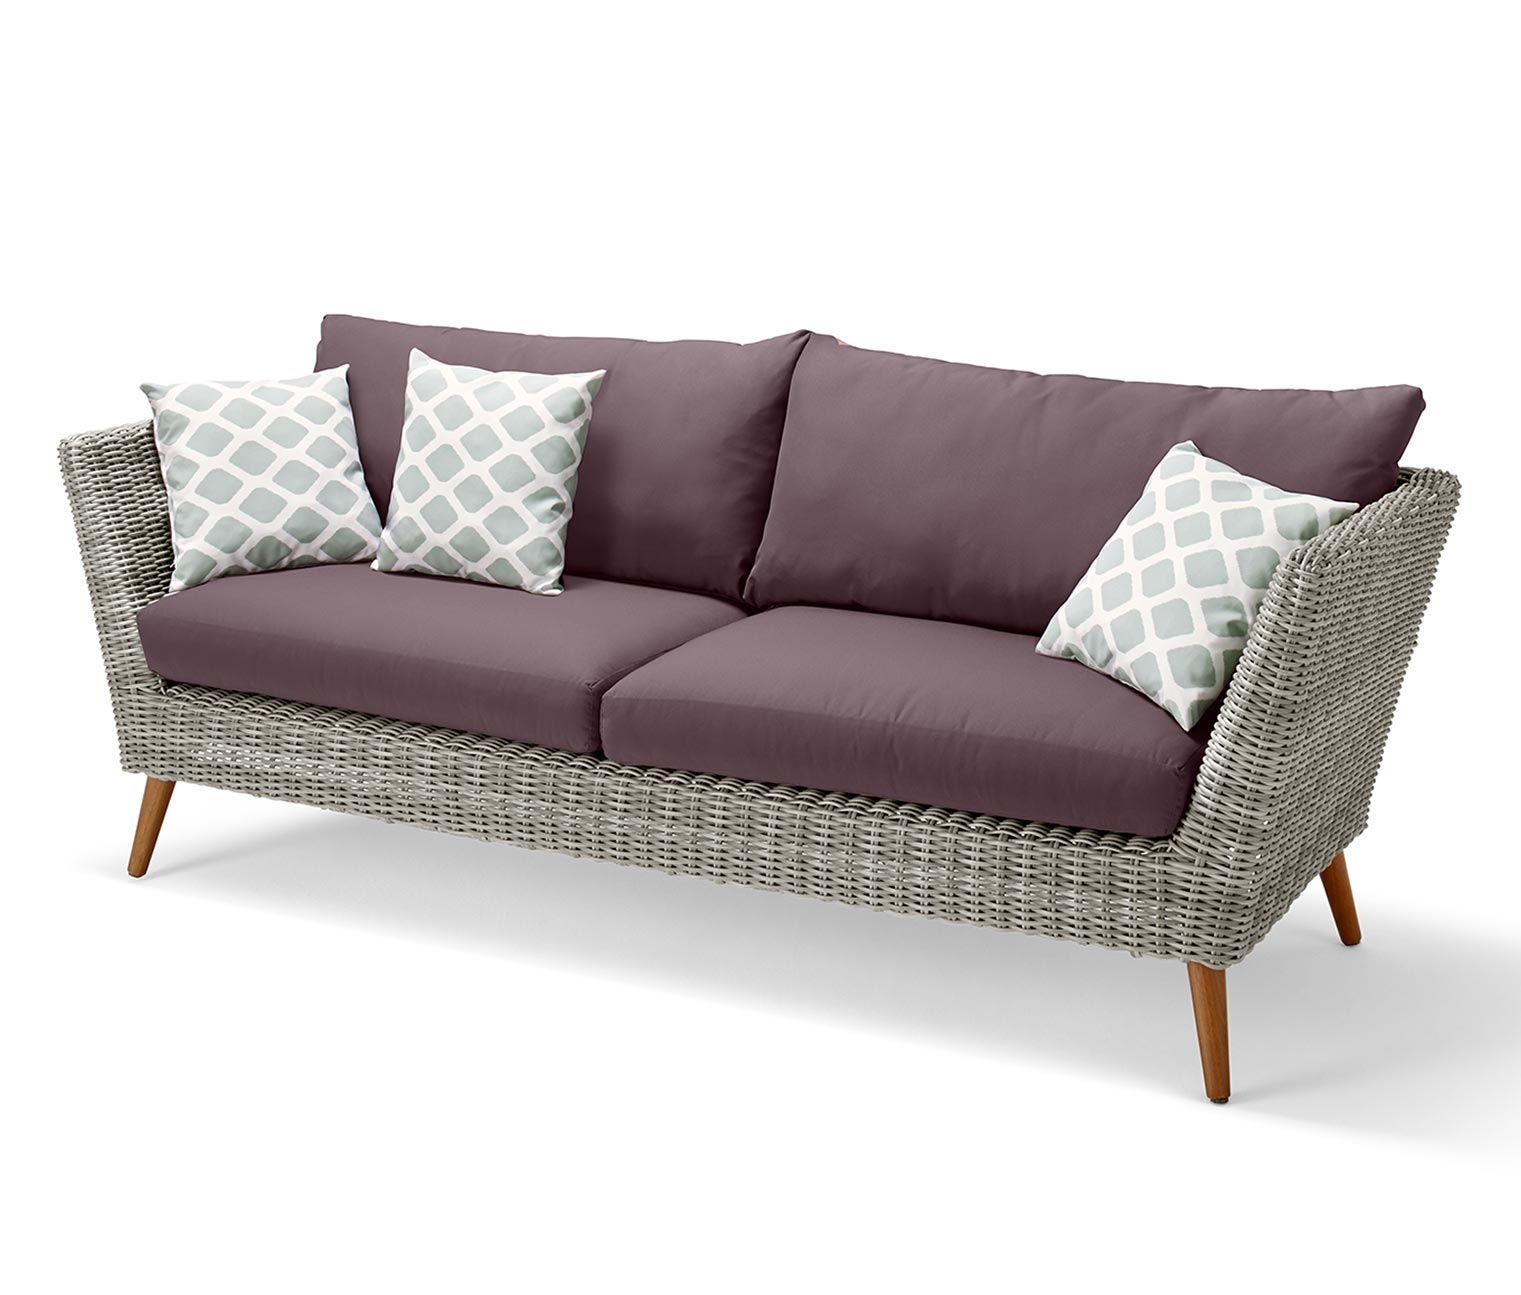 Tchibo Sofa 3 sitzer outdoor sofa bestellen bei tchibo 336726 möbel